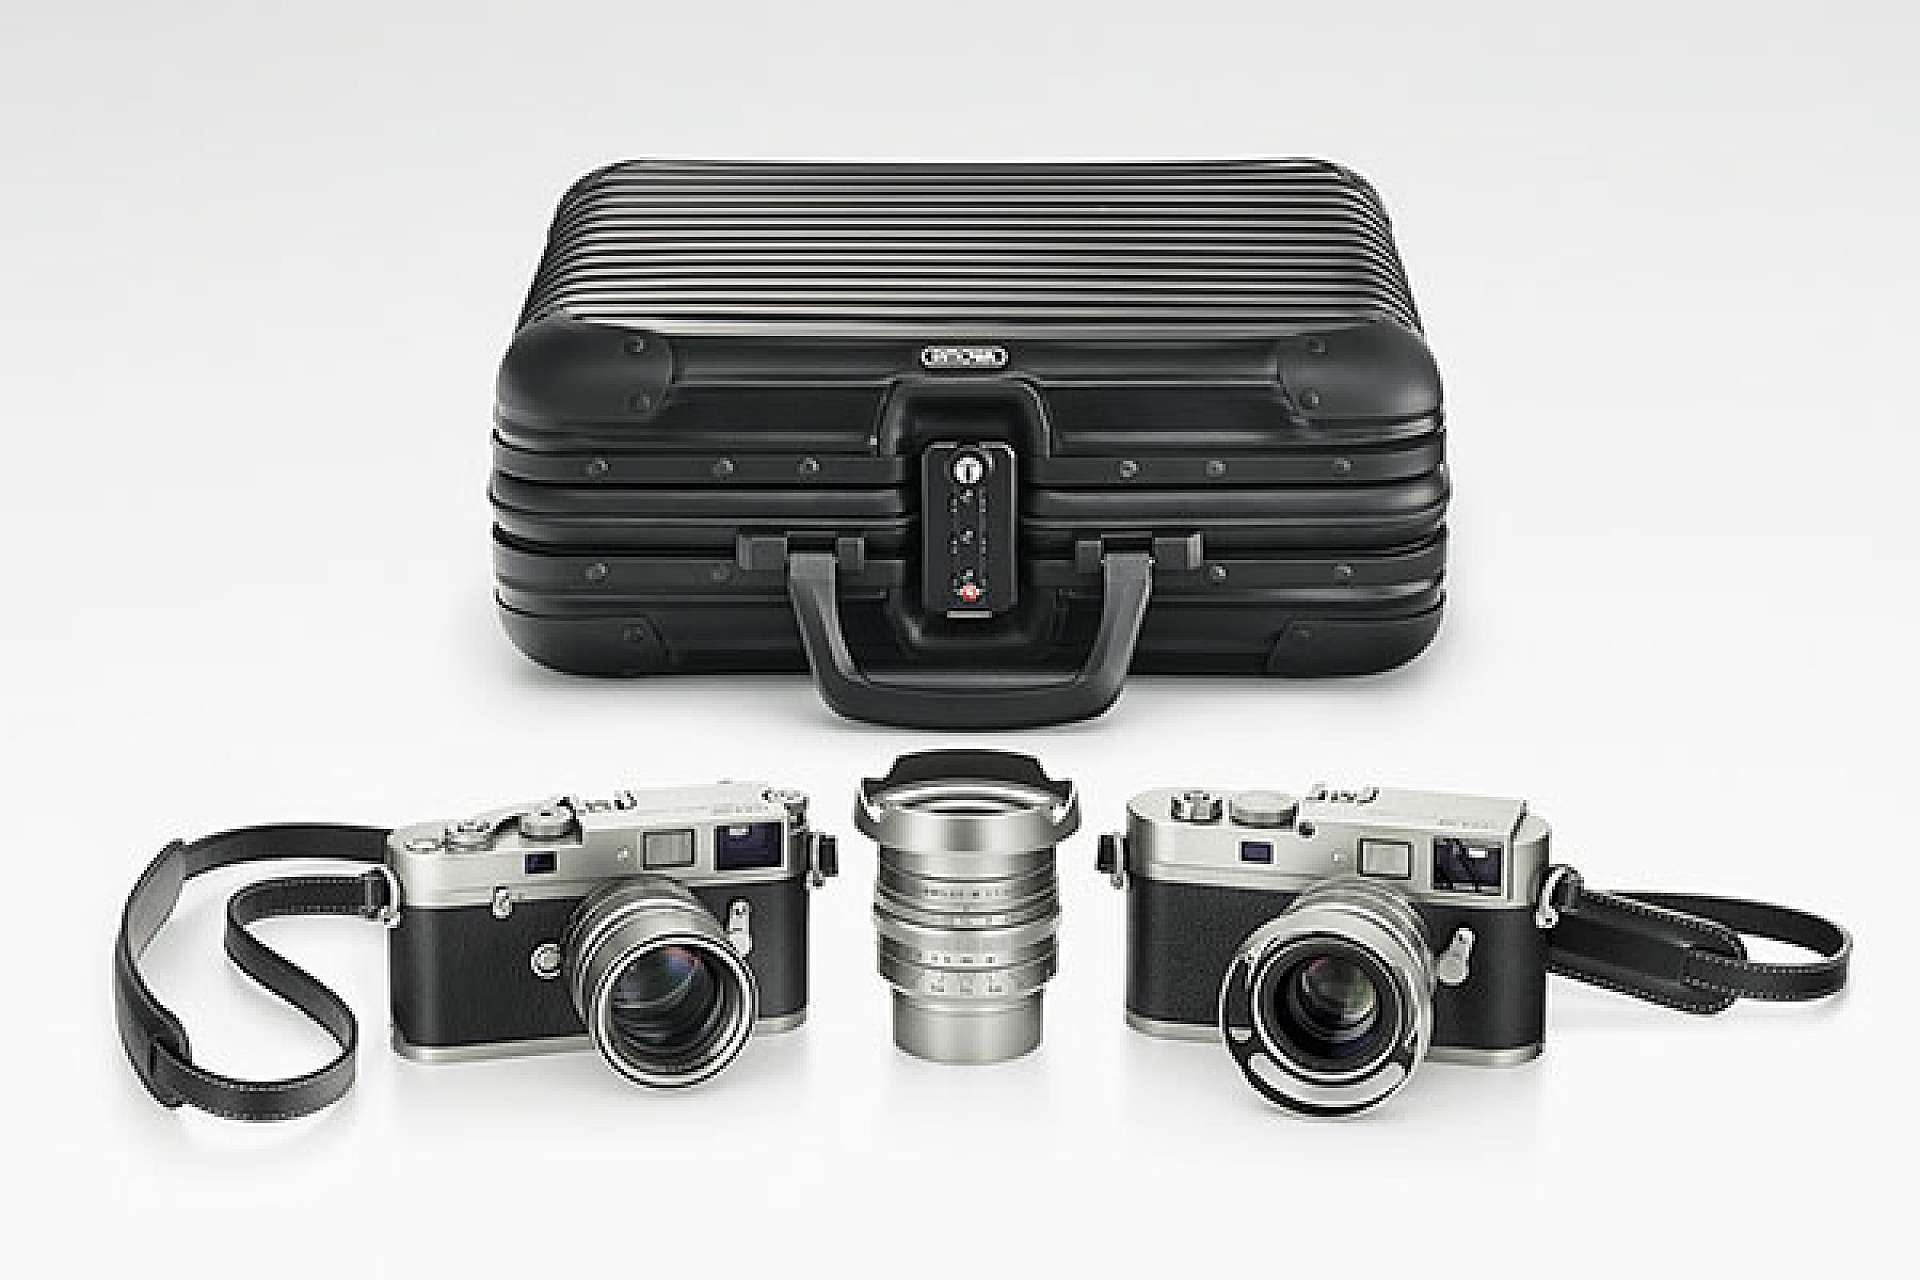 Leica M-A: Ny analog kamera från Leica   Kamera & Bild